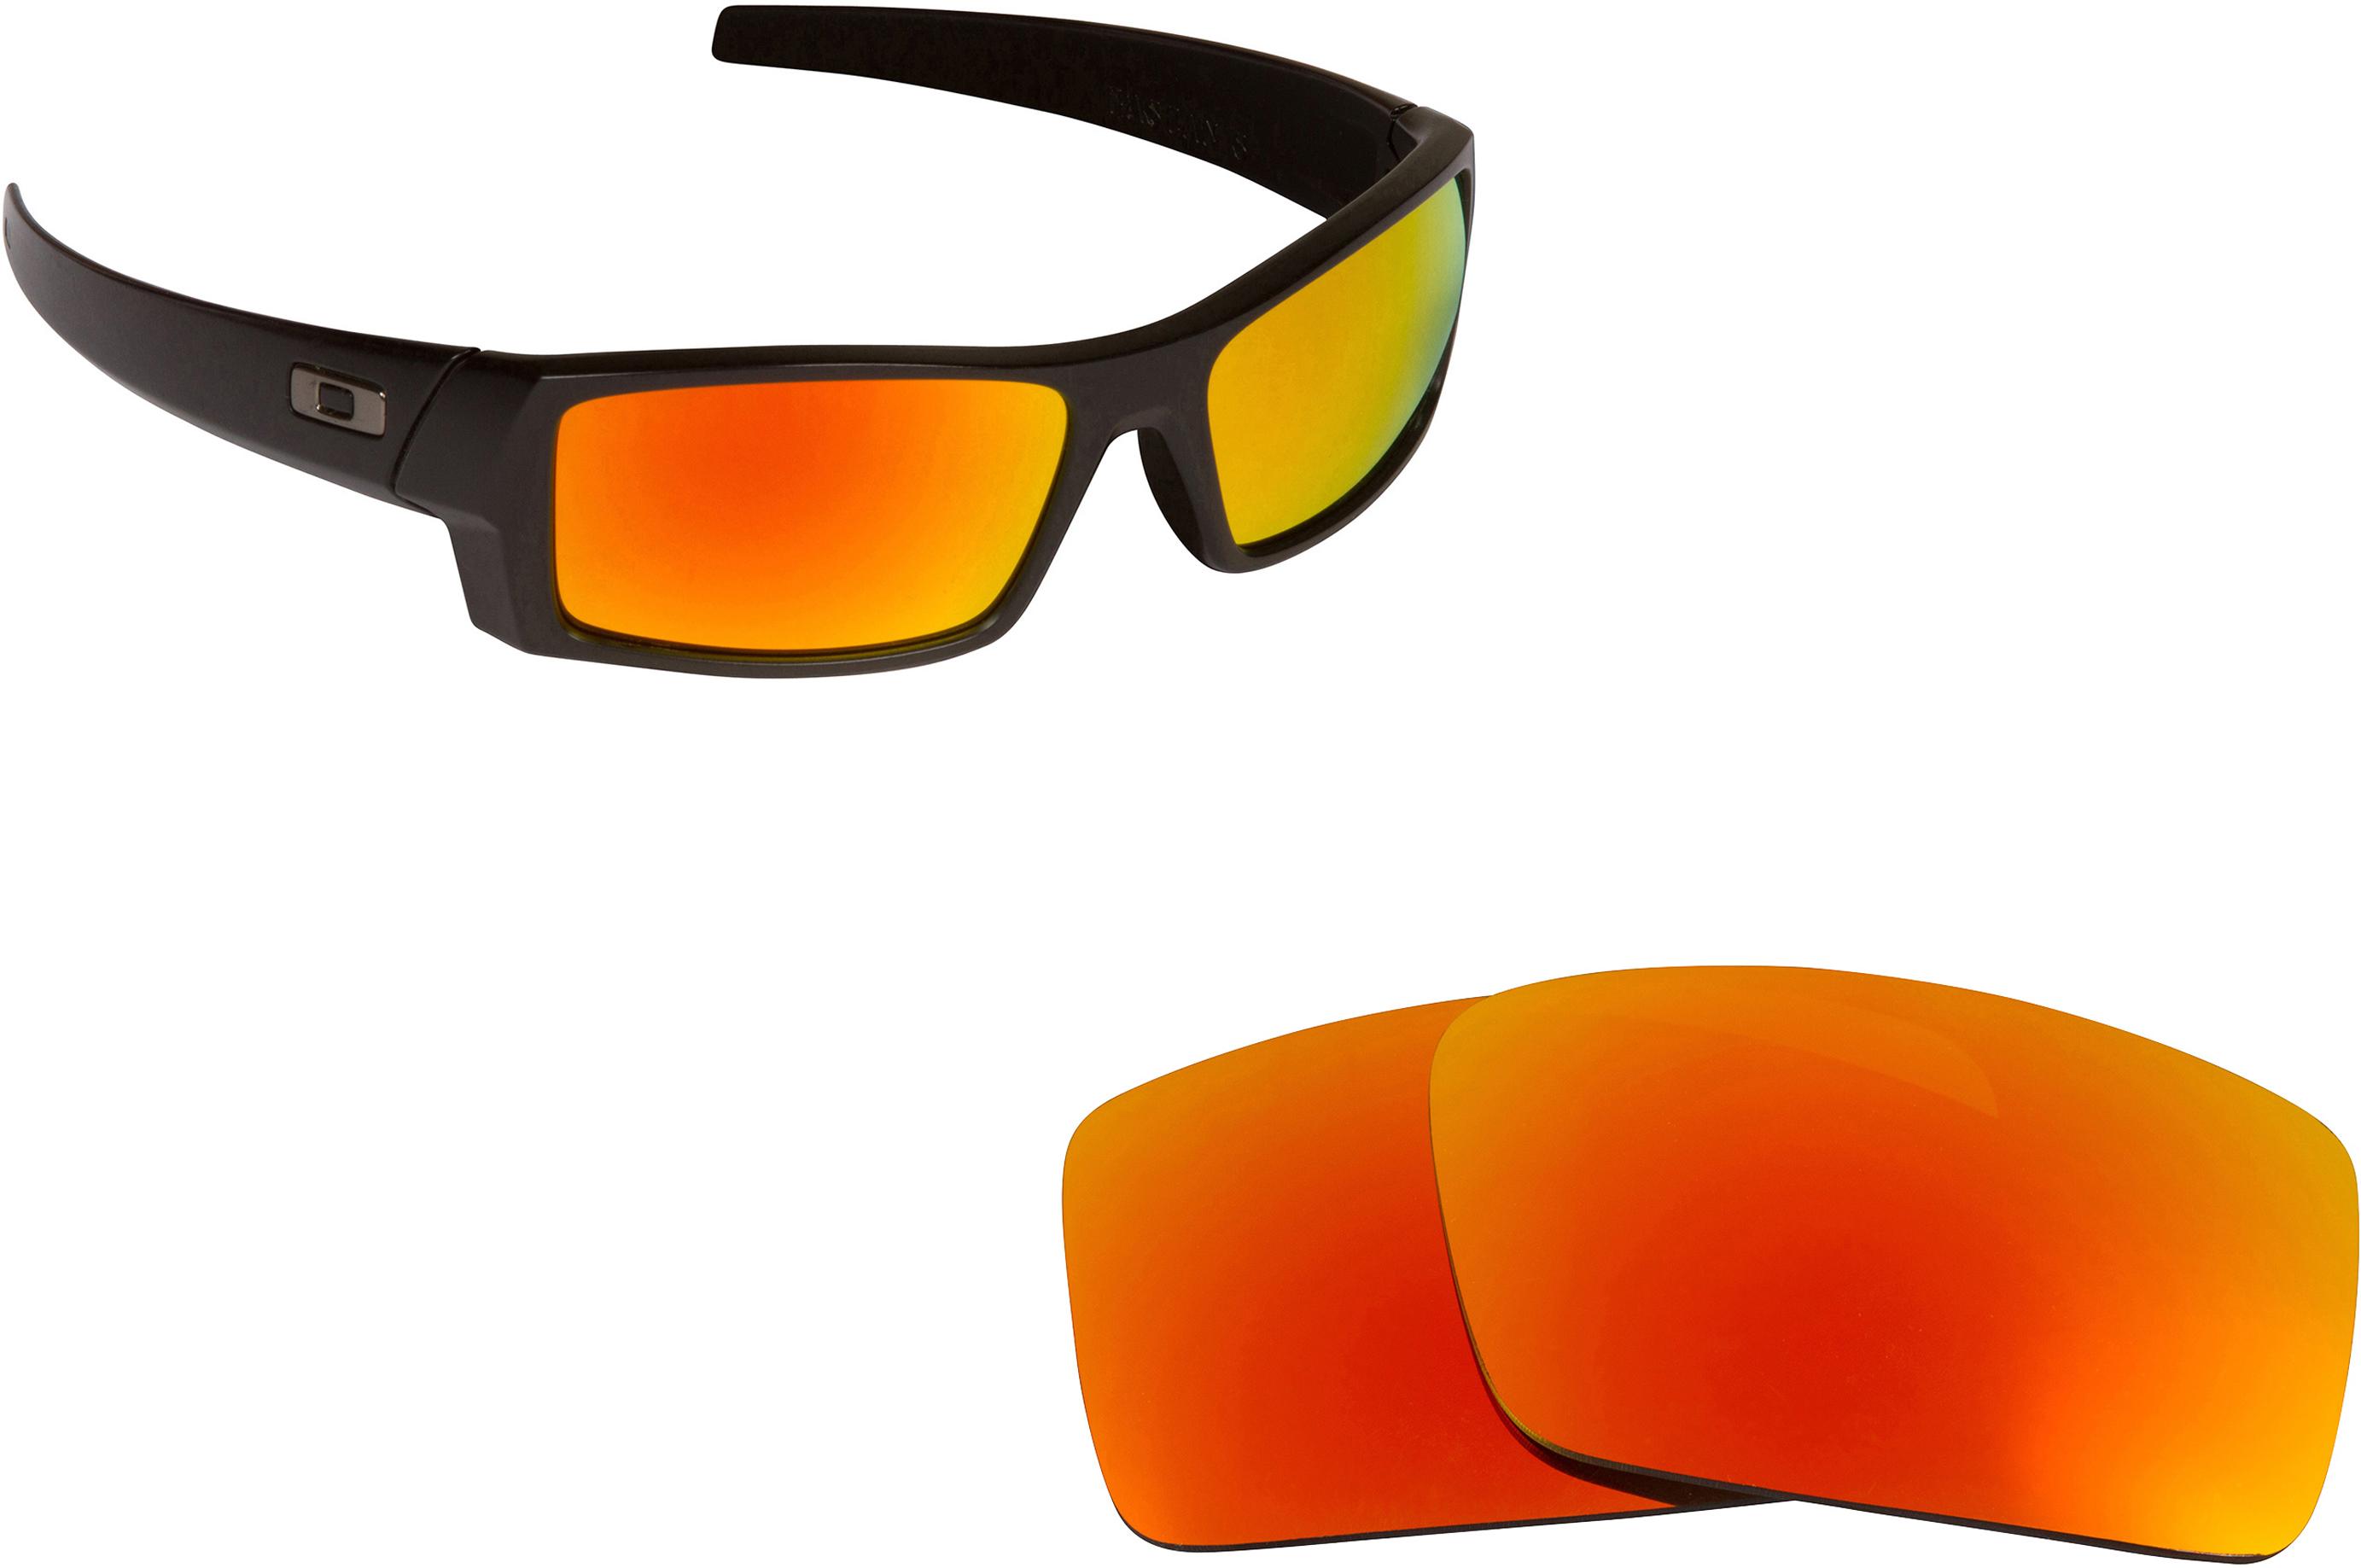 294a8b68c1 Ebay Fake Oakley Sunglasses